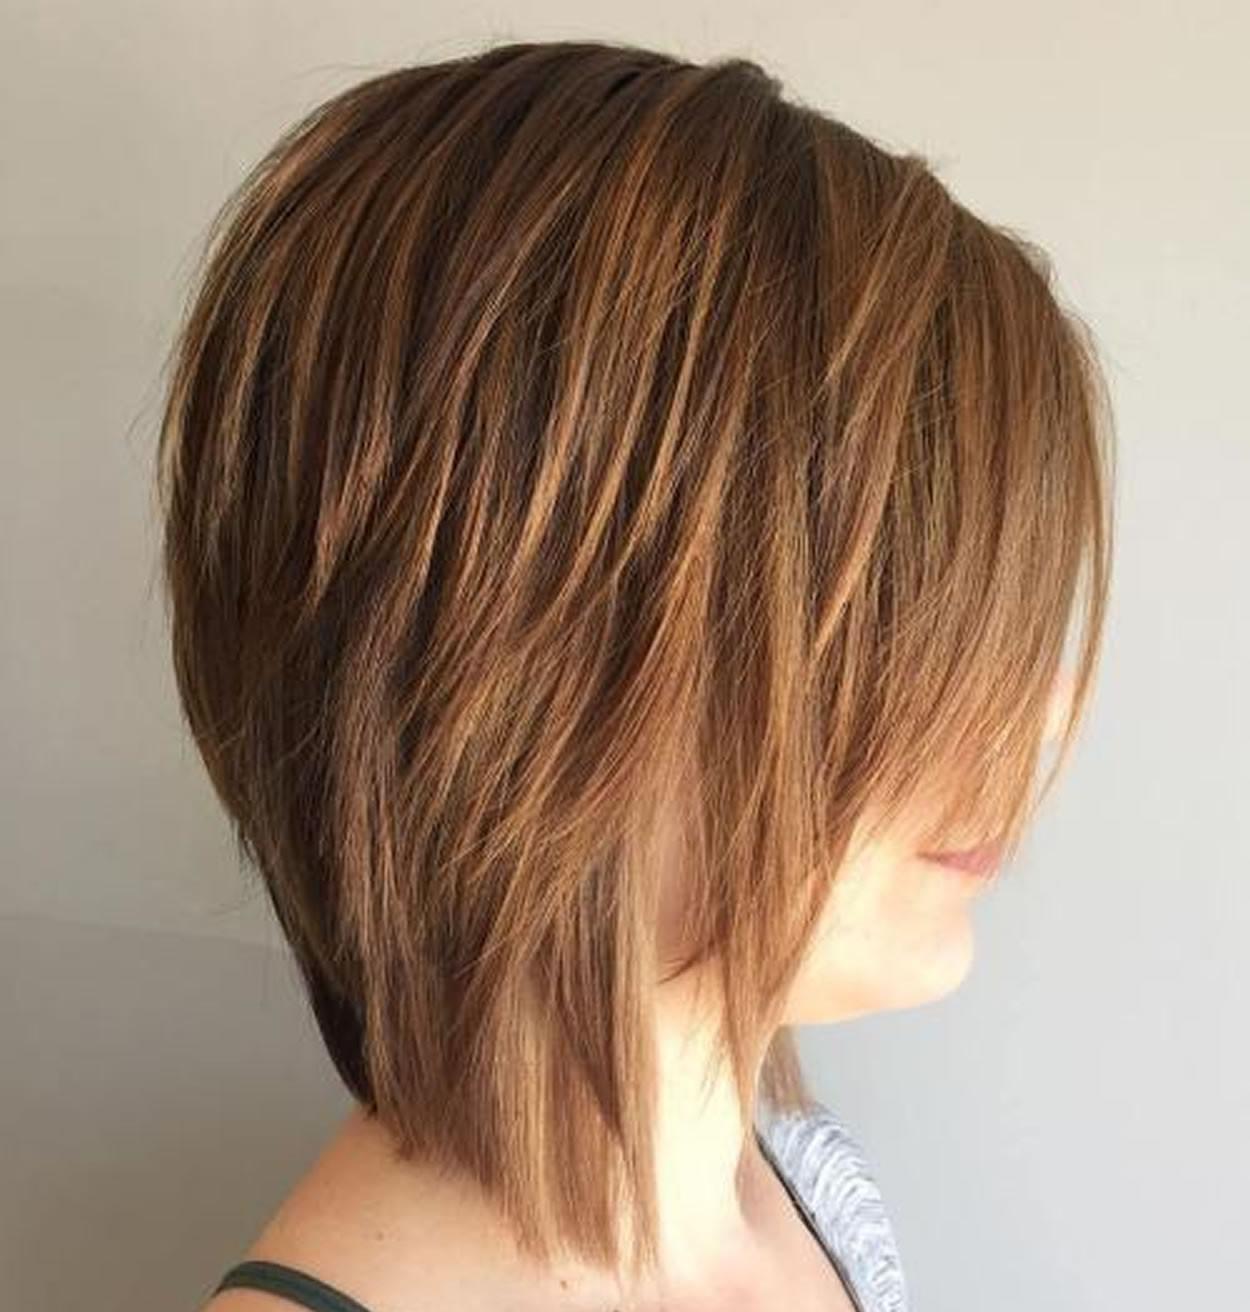 Shaggy Bob Haircuts 2019  20 Best Worldwide Chic Shag Haircut Solutions